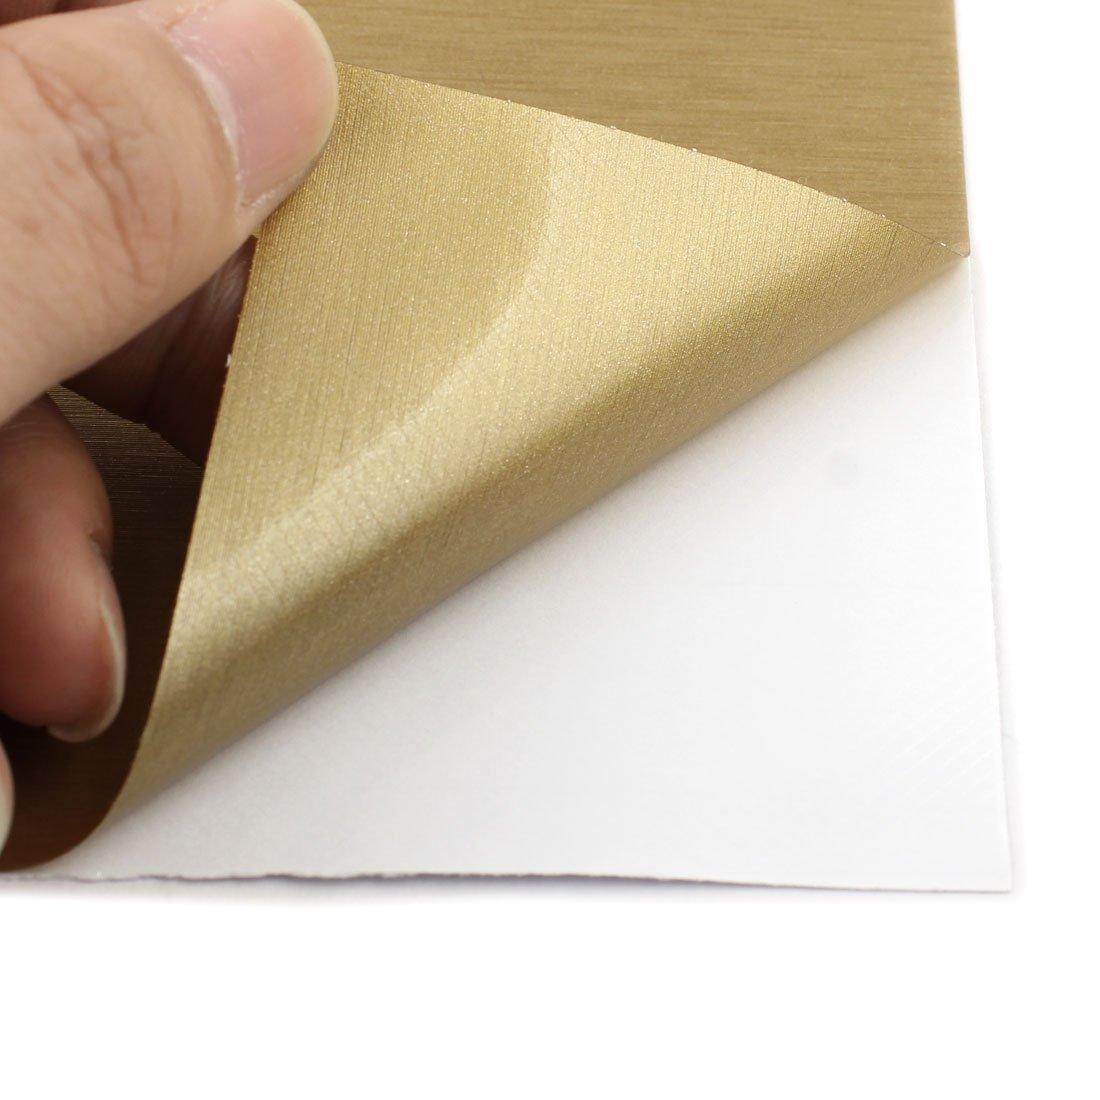 Amazon.com : eDealMax 20cm x 15cm de PVC antideslizante protectora adhesiva DIY etiqueta engomada del teléfono 2 PCS de la luz ámbar : Sports & Outdoors